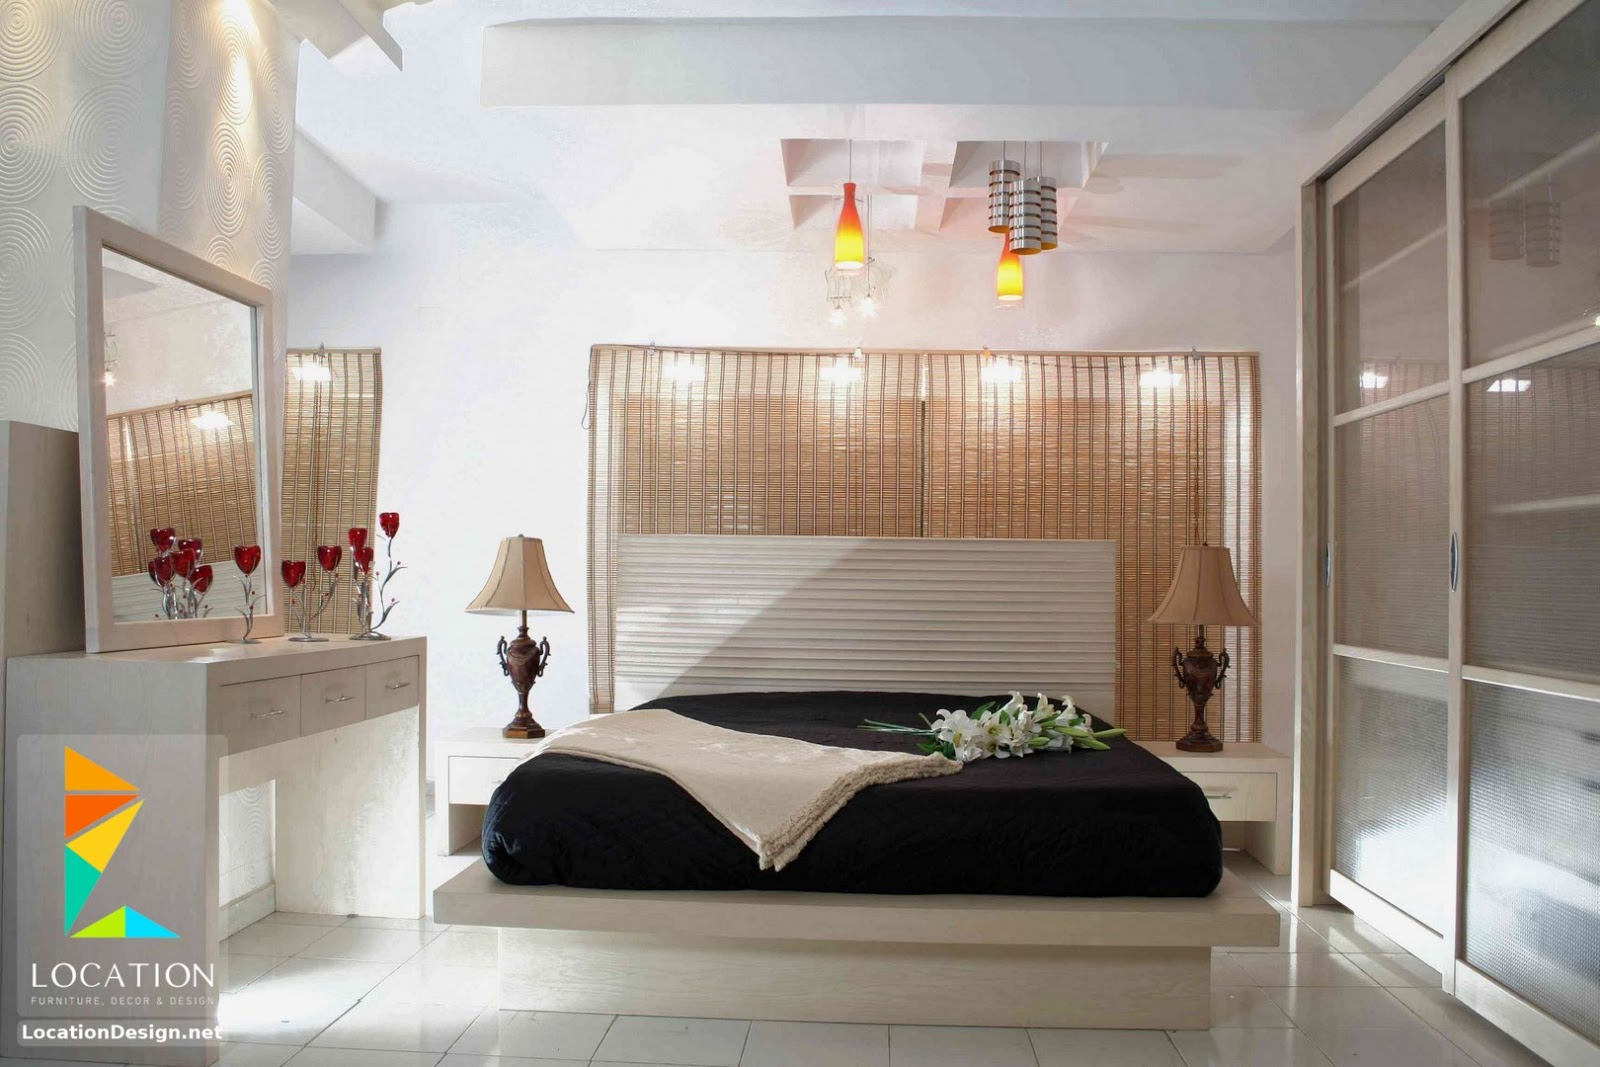 غرف نوم كامله مودرن Bedrooms Egypt